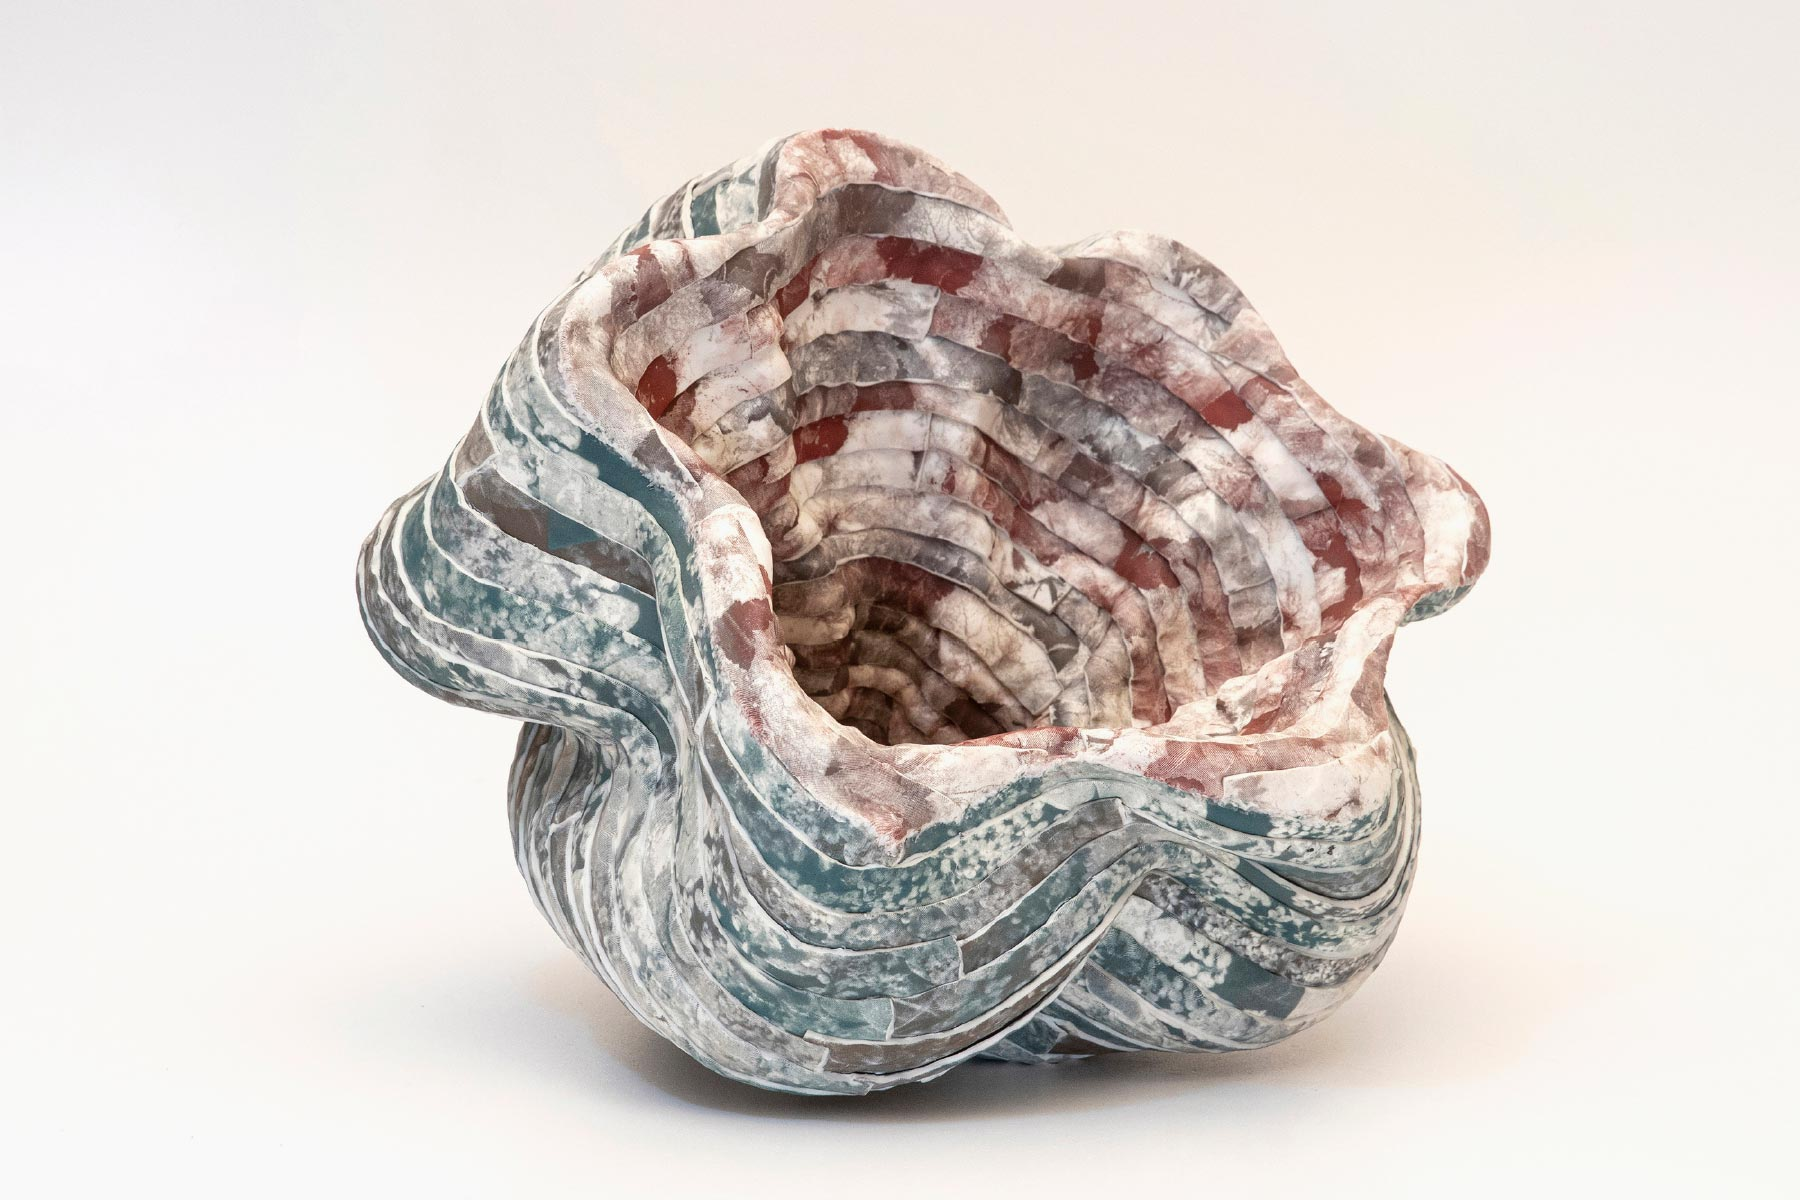 Sara Dario Sculpture Double Nature Porcelain 1280 Photo Serigraphy